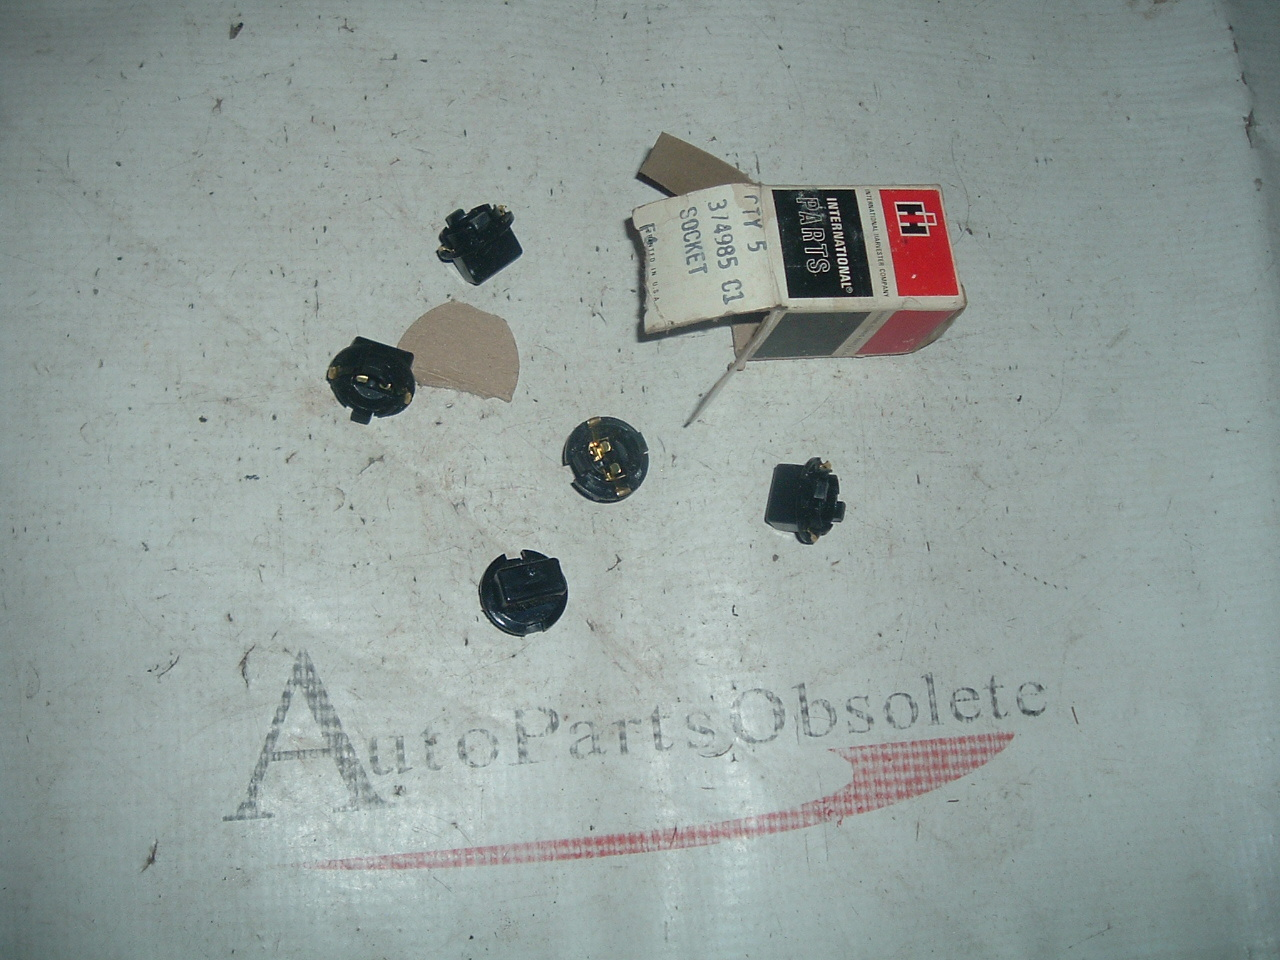 1969 71 73 75 internation scout truck dash panel light bulb sockets nos # 374985-C1 (z 374985-C1)